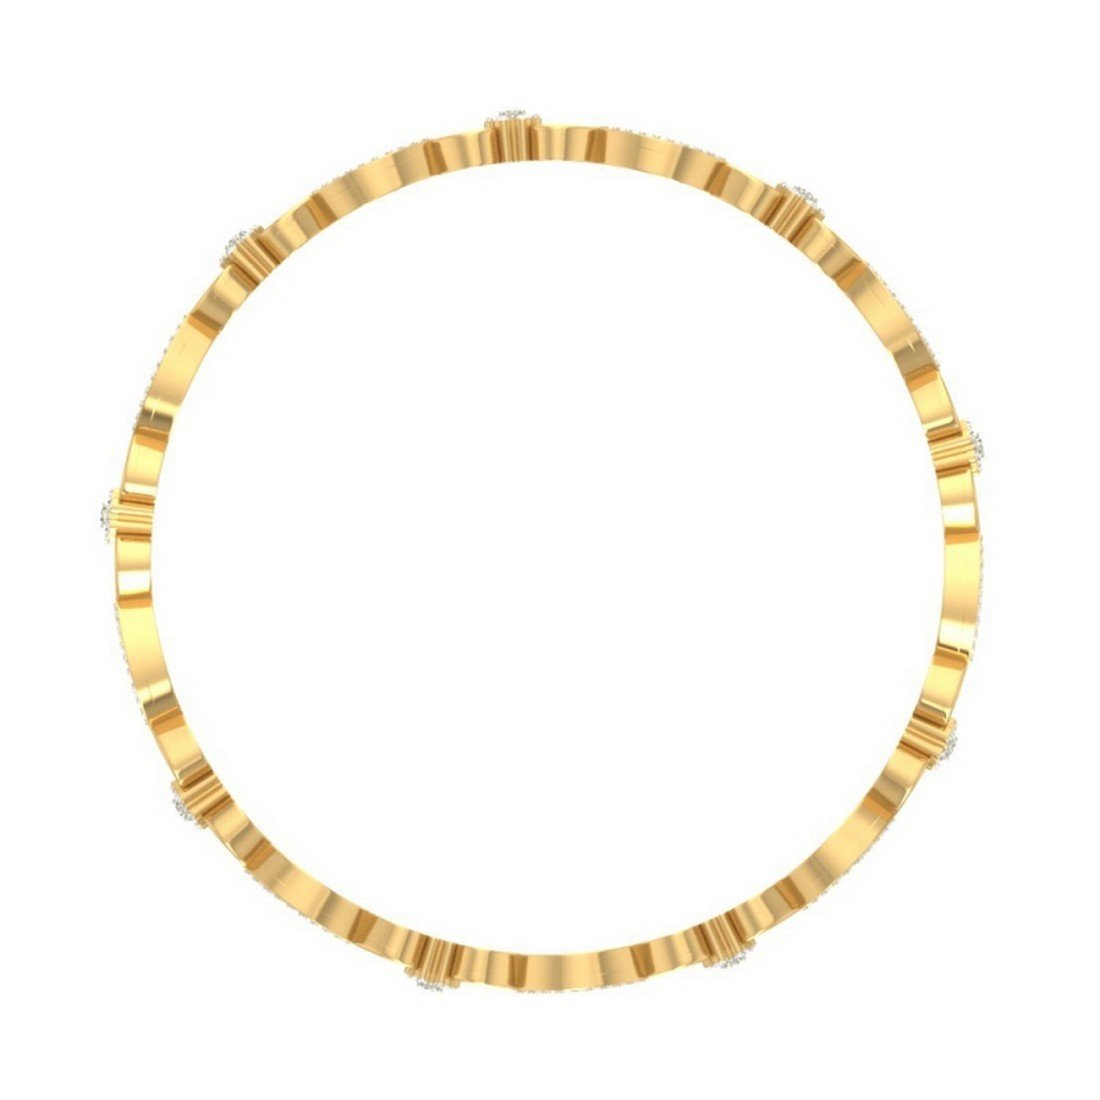 2.92 cttw Round-Cut-Diamond IJ  SI 18K Yellow Gold bangle-bracelets Size 9.75 inches